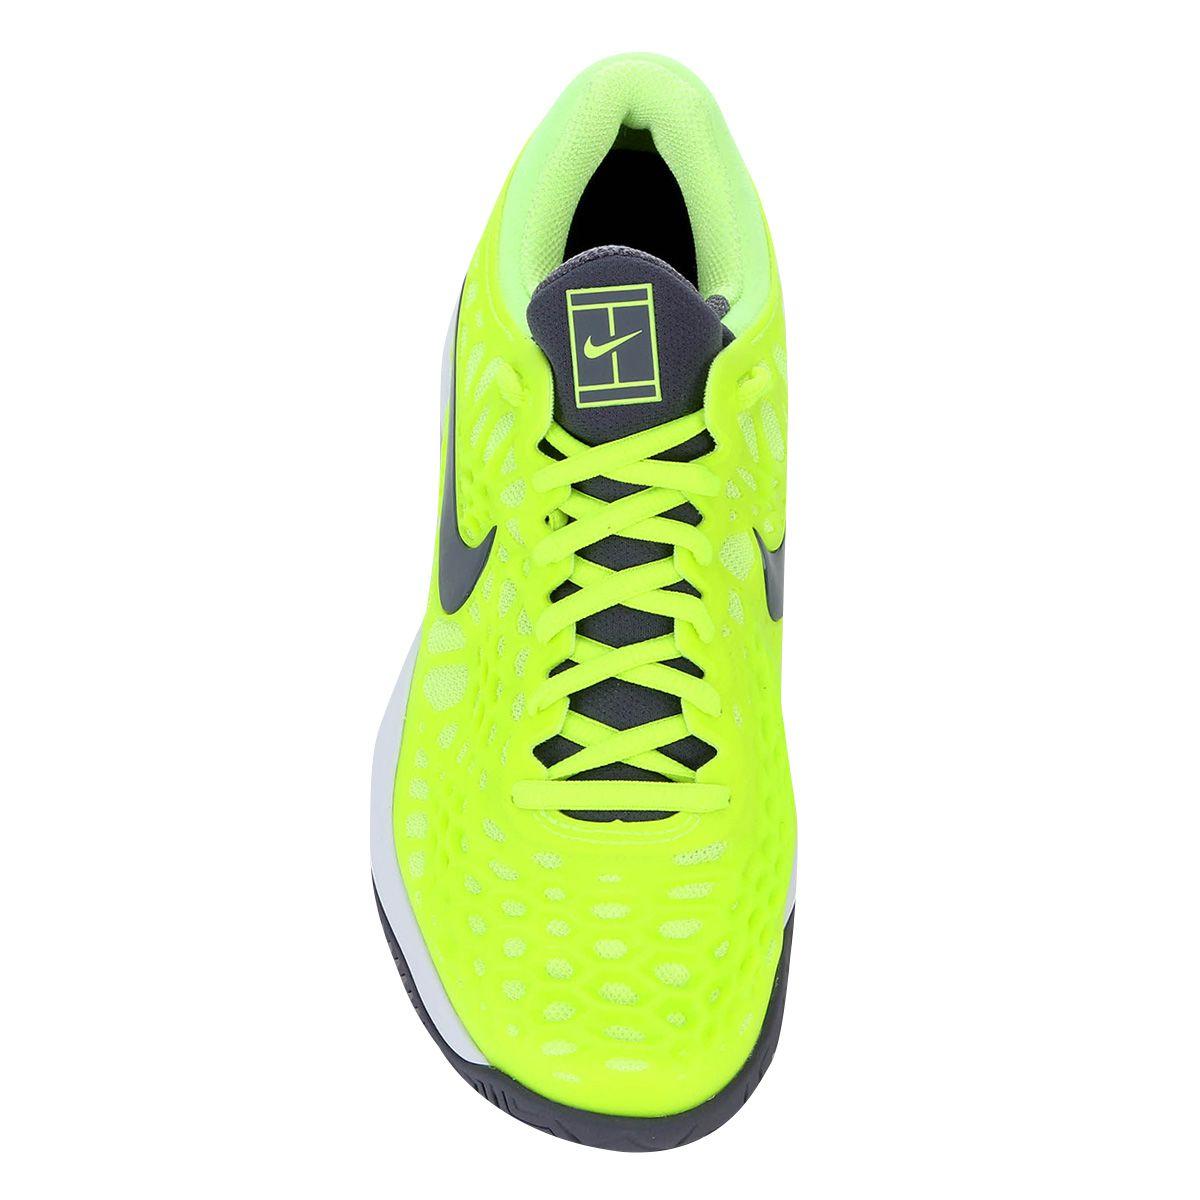 Tênis Nike Air Zoom Cage 3 HC Rafael Nadal - Amarelo Limão e Cinza